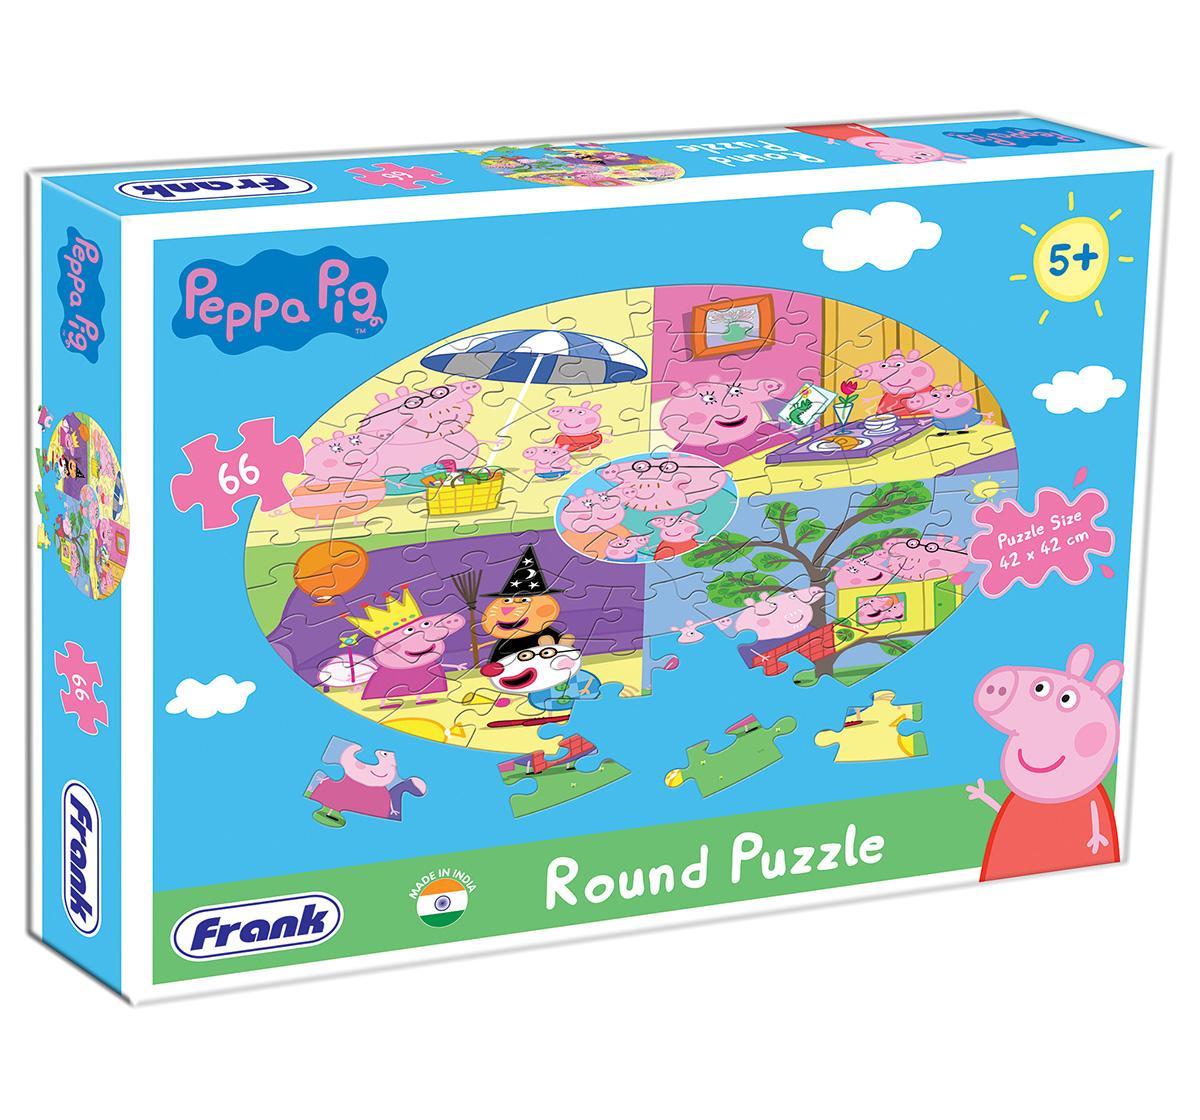 Peppa Pig | Peppa Pig Round Puzzle 66 pcs, 5Y+